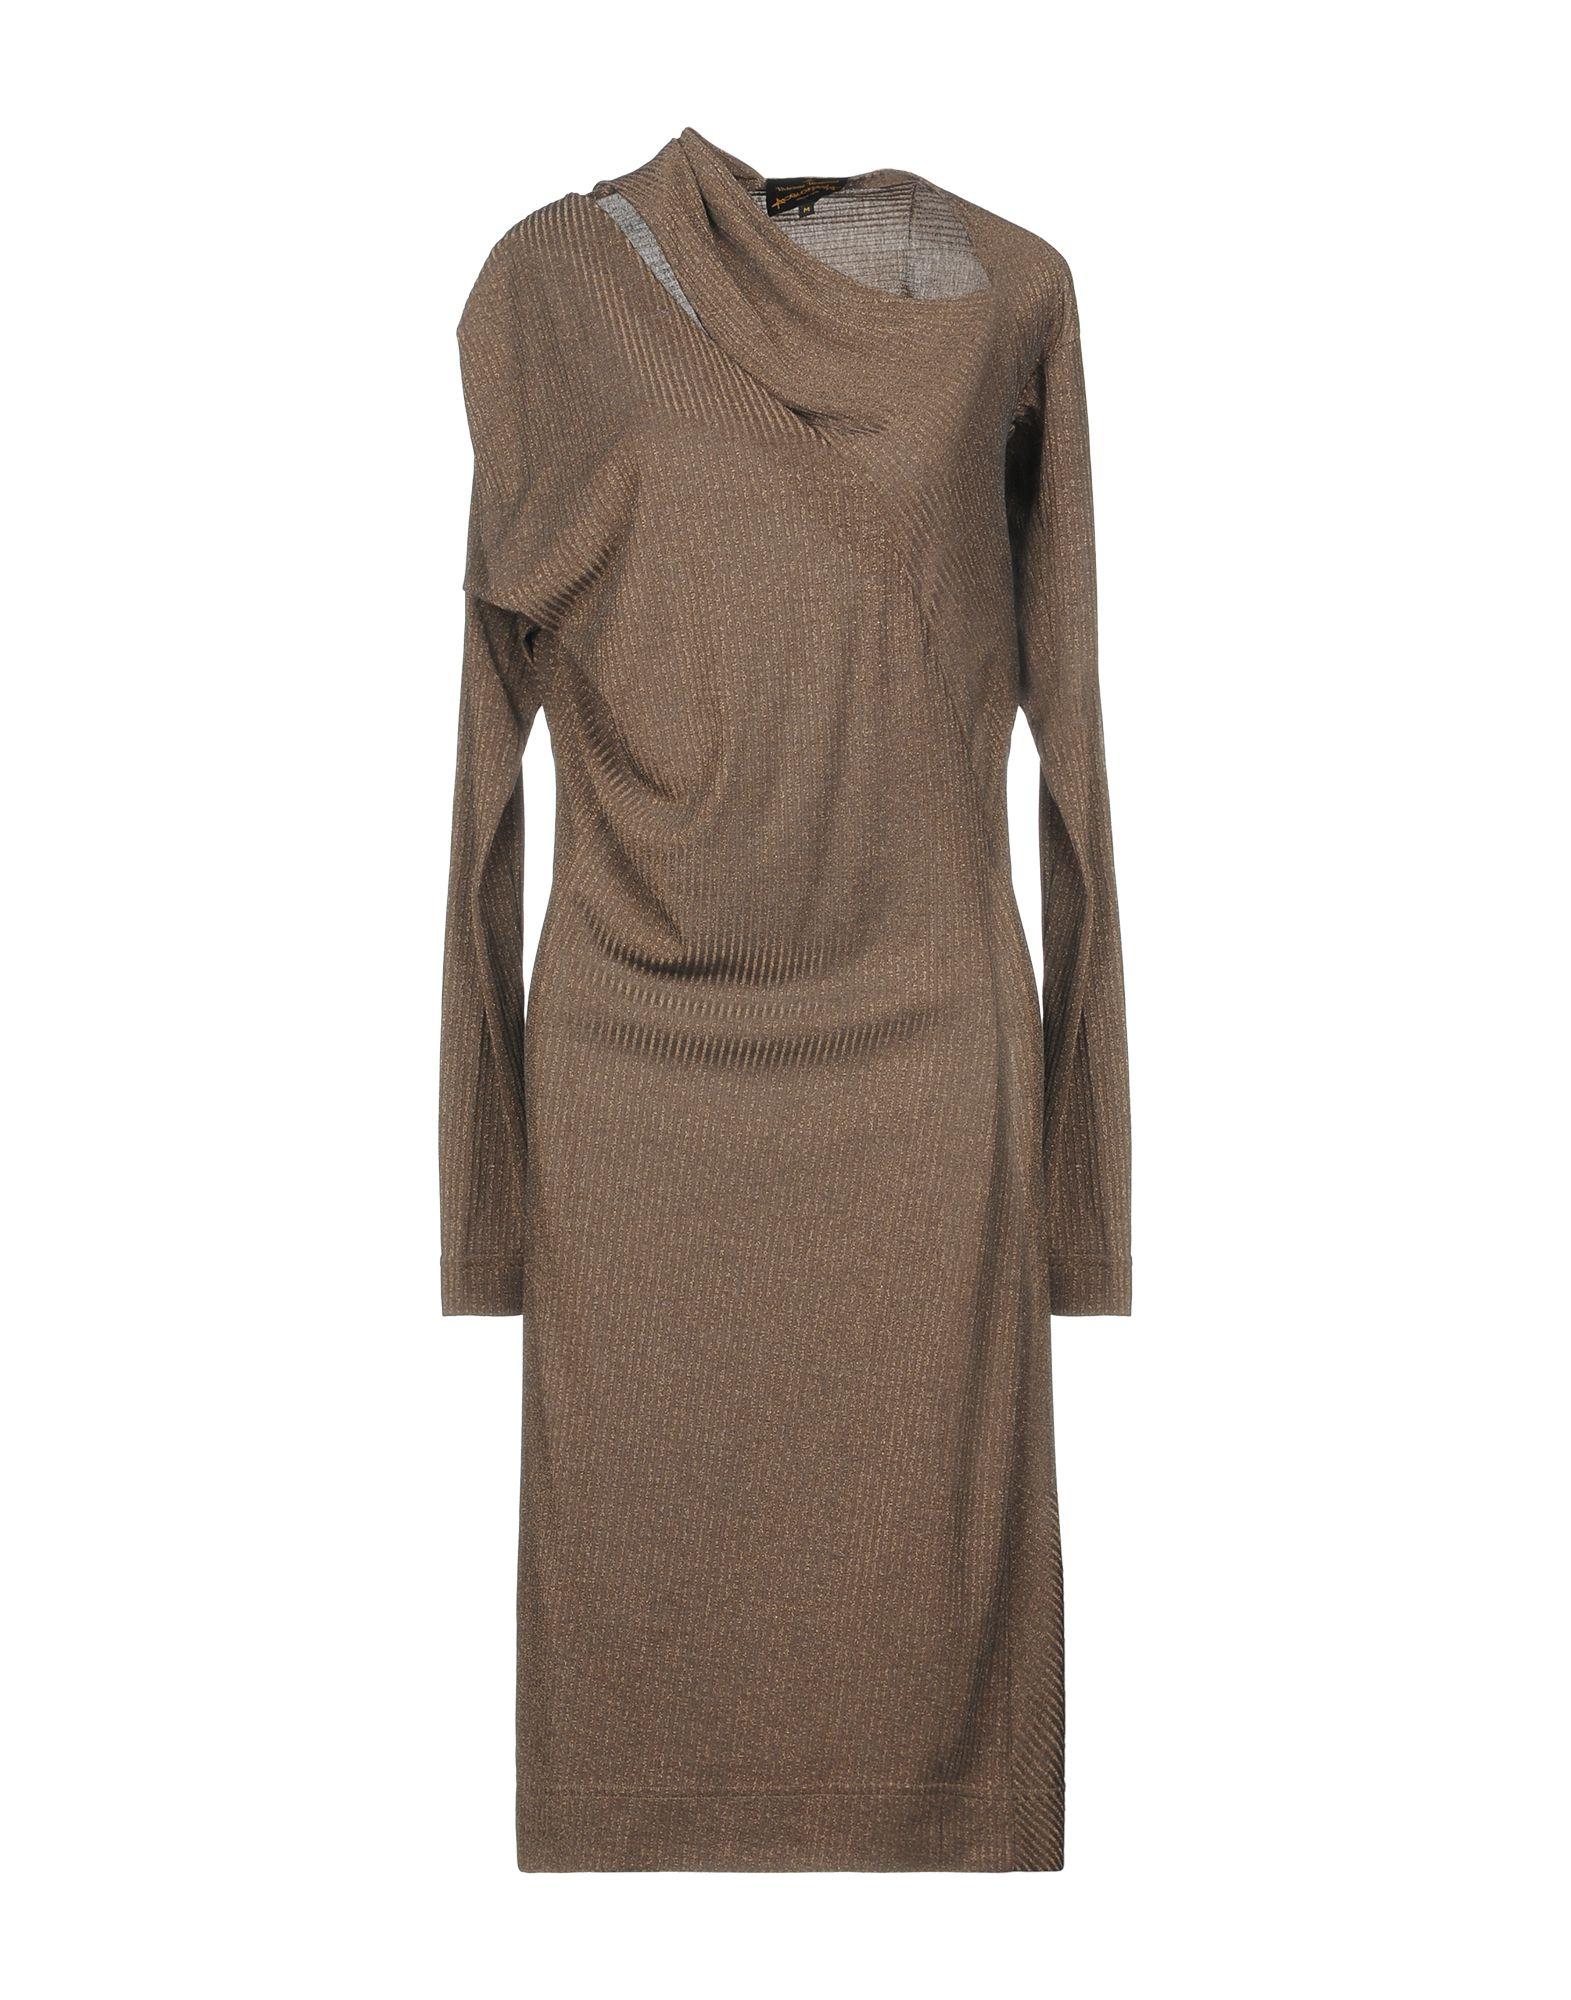 VIVIENNE WESTWOOD ANGLOMANIA Платье длиной 3/4 vivienne westwood anglomania платье длиной 3 4